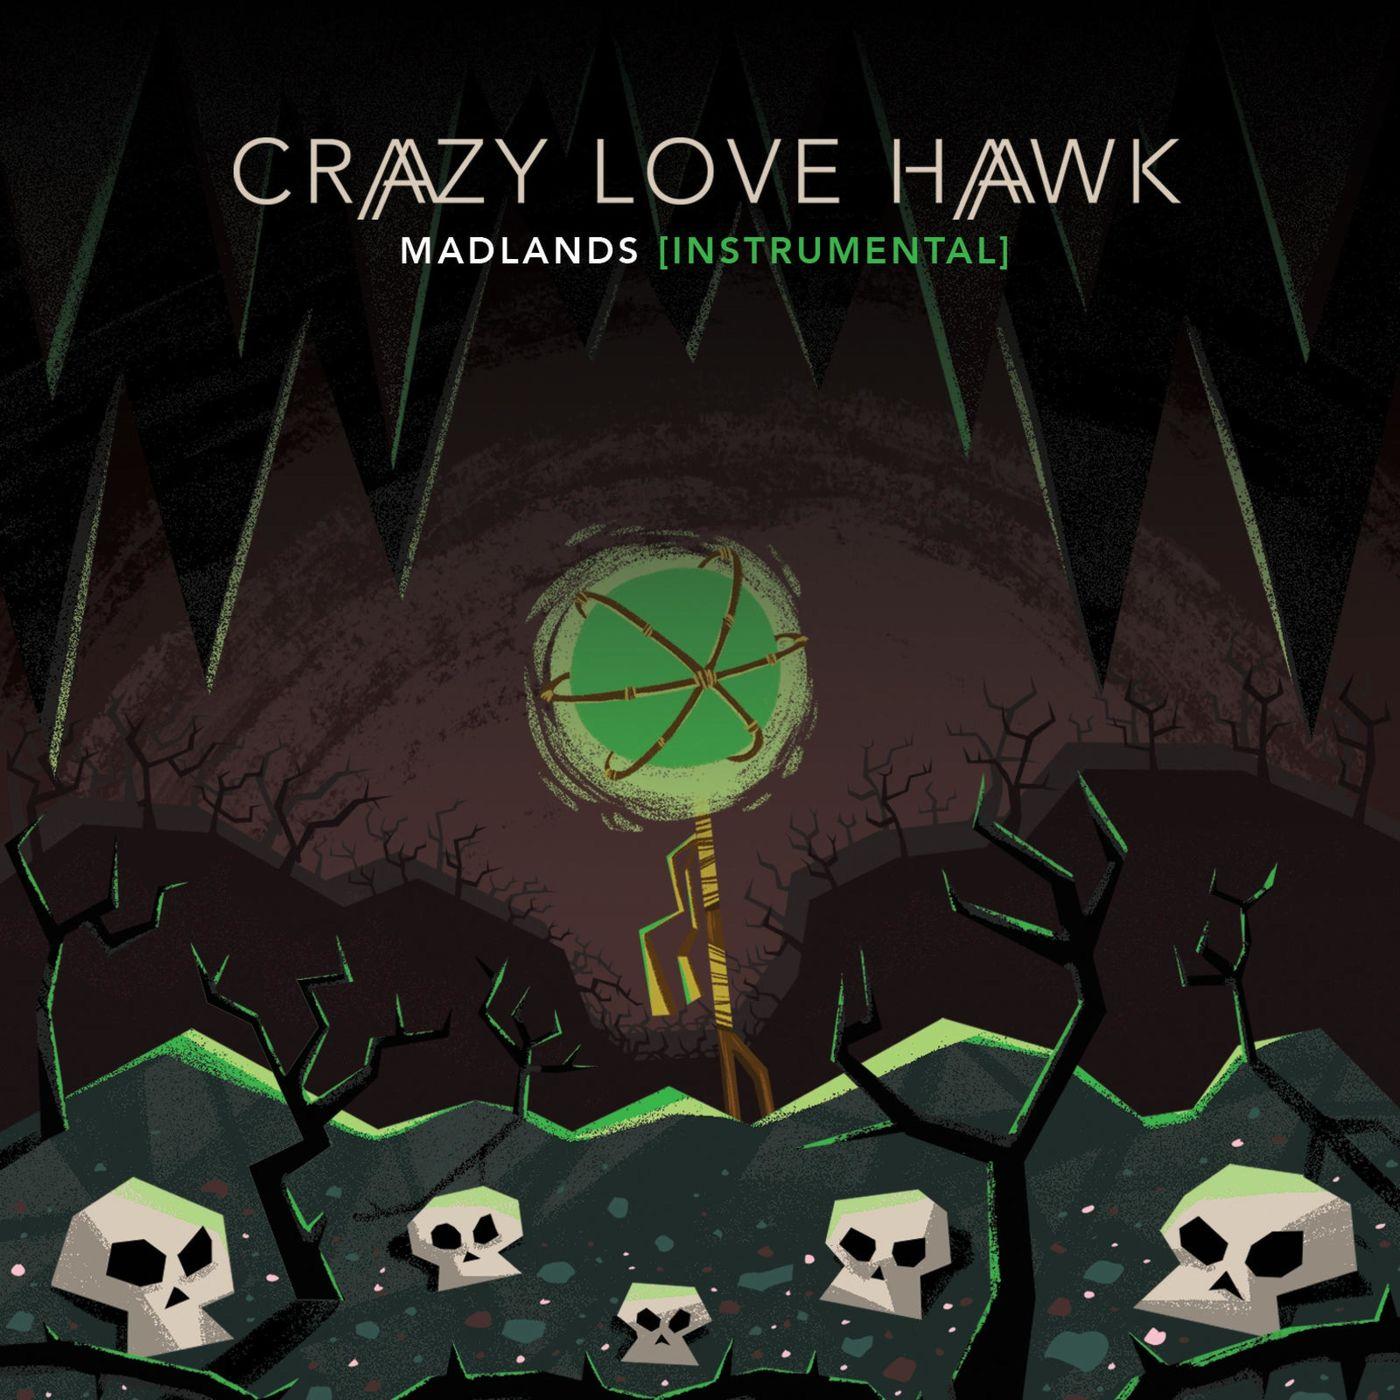 Crazy Love Hawk - Madlands (Instrumental) (2020)